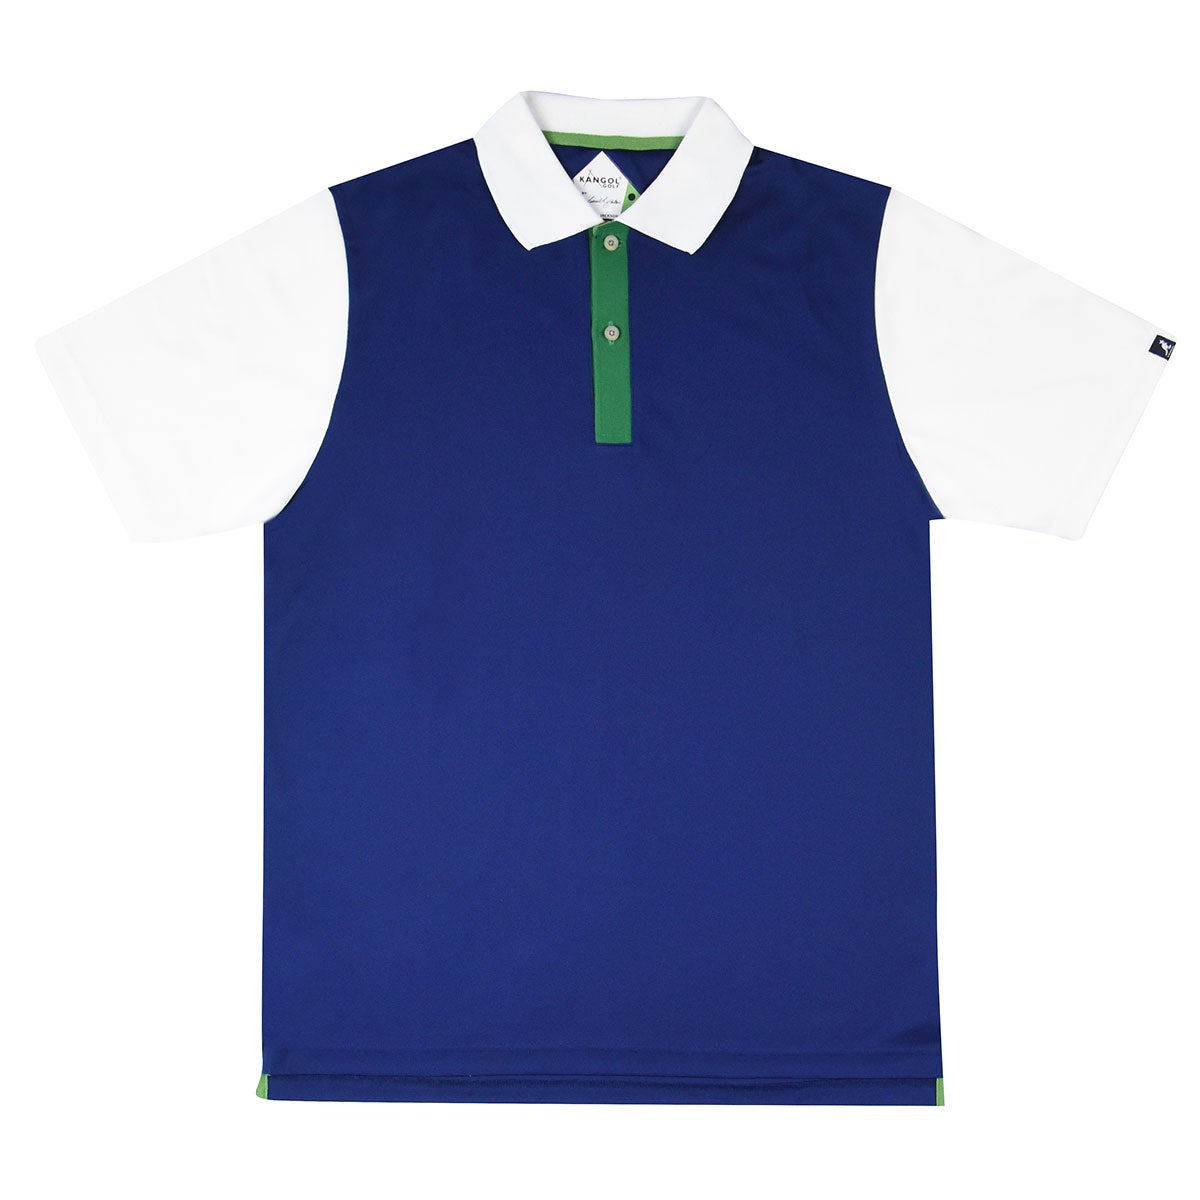 Kangol Samuel L. Jackson Golf Colour Block Polo Shirt in Navy